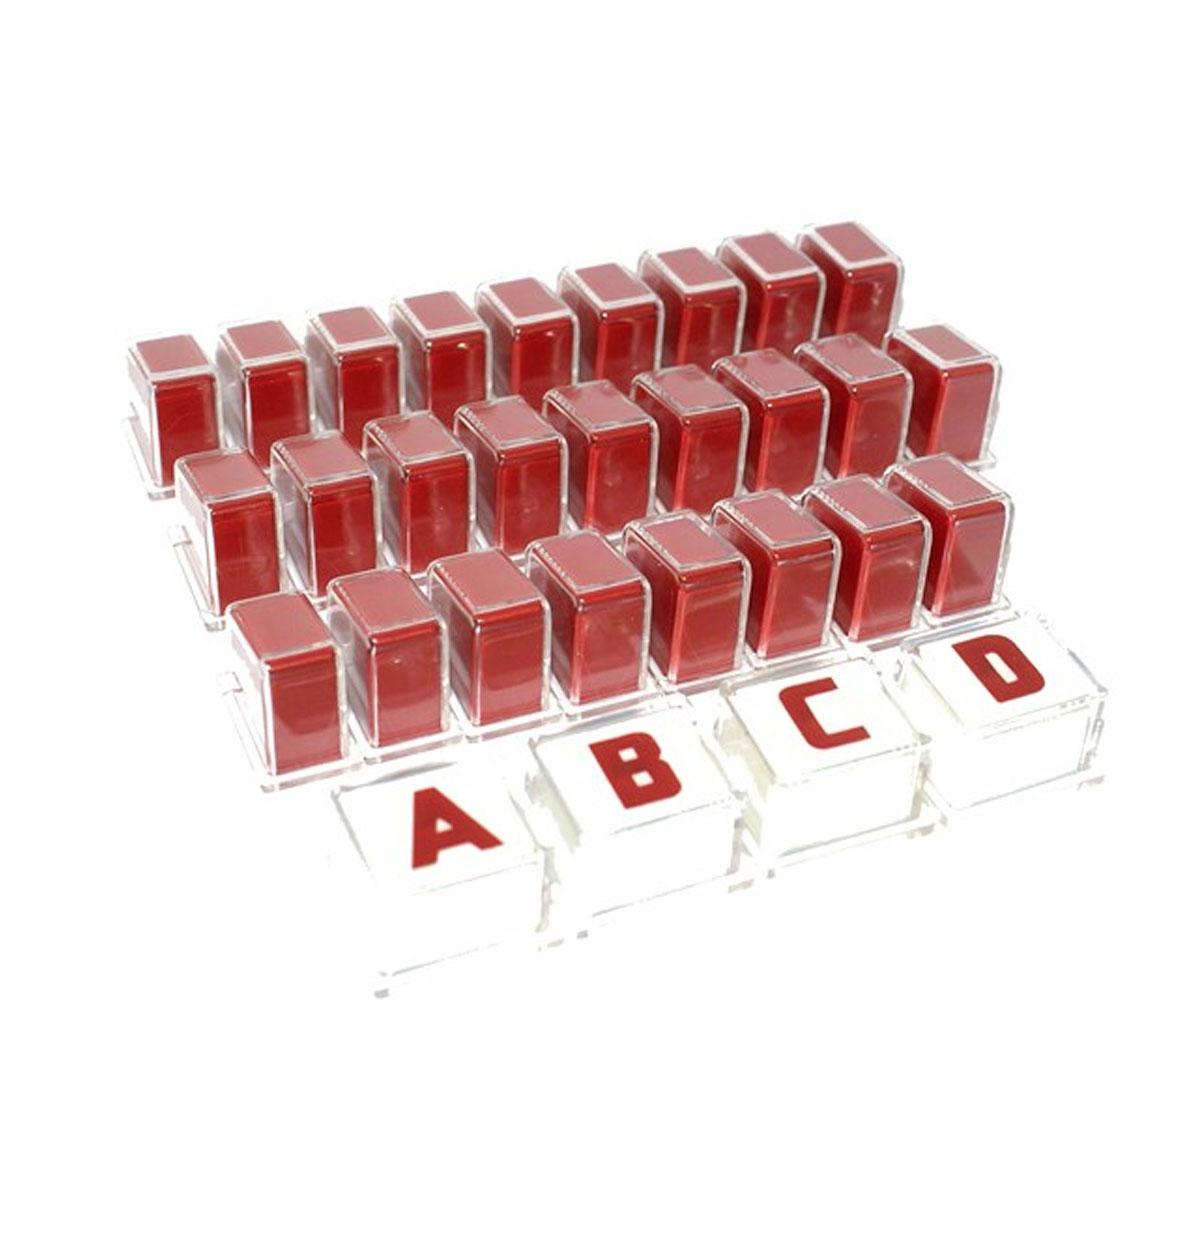 Wurlitzer 1700 jukebox Drukknoppen Set